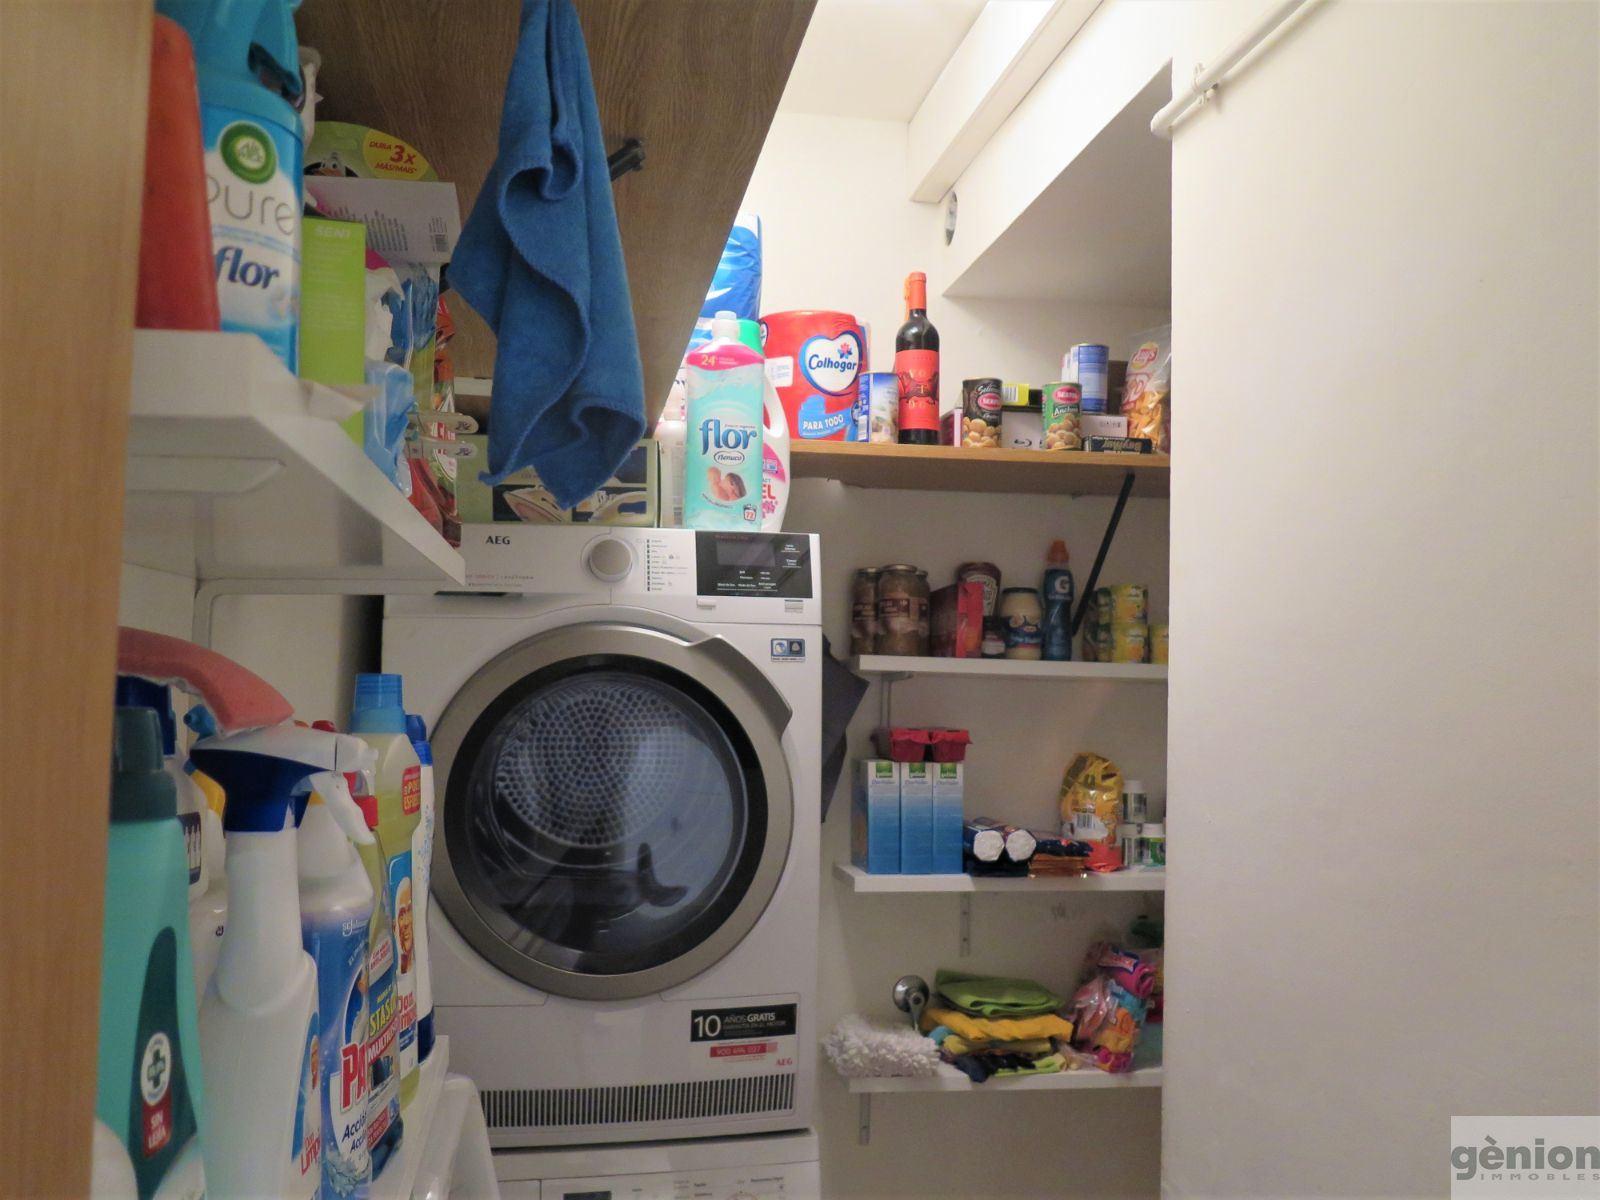 THREE-BEDROOM GROUND-FLOOR APARTMENT IN GIRONA'S LA DEVESA DISTRICT. PEDESTRIANISED STREET